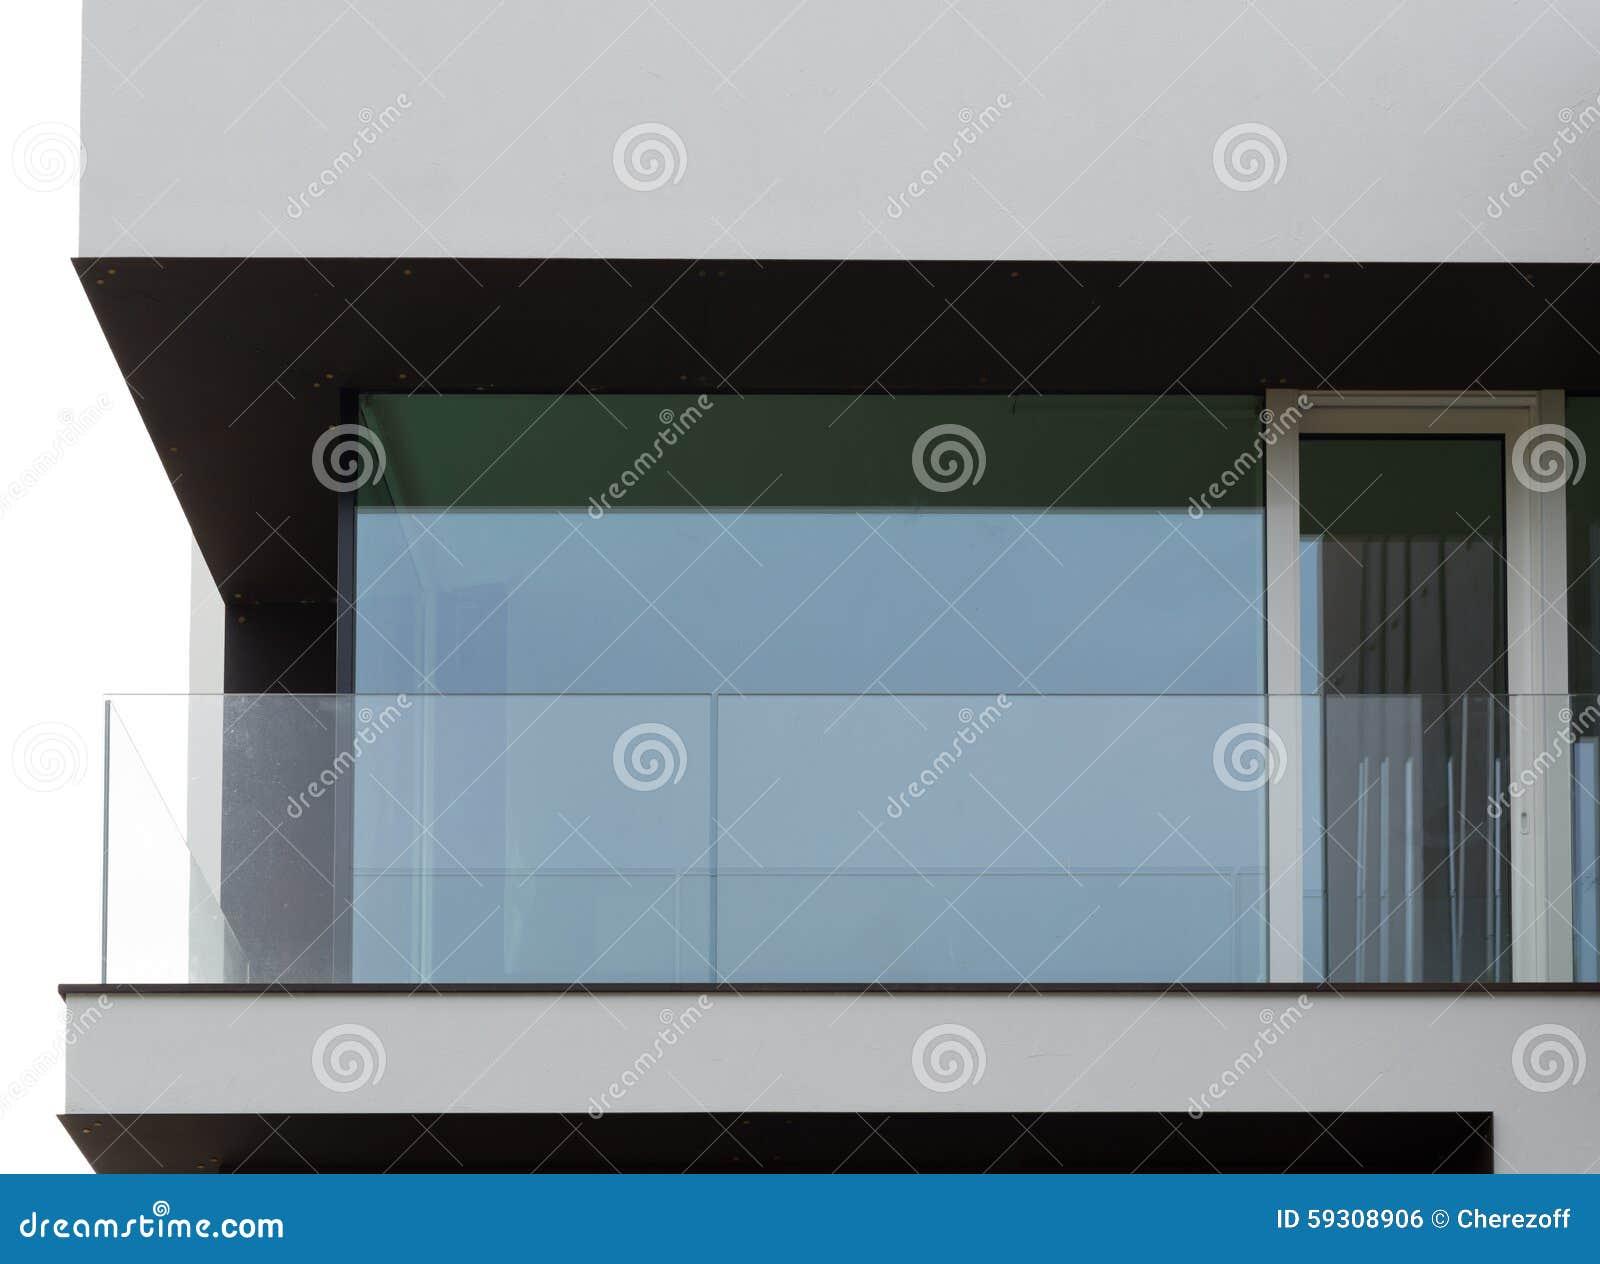 Balc n de cristal foto de archivo imagen 59308906 - Balcones de cristal ...